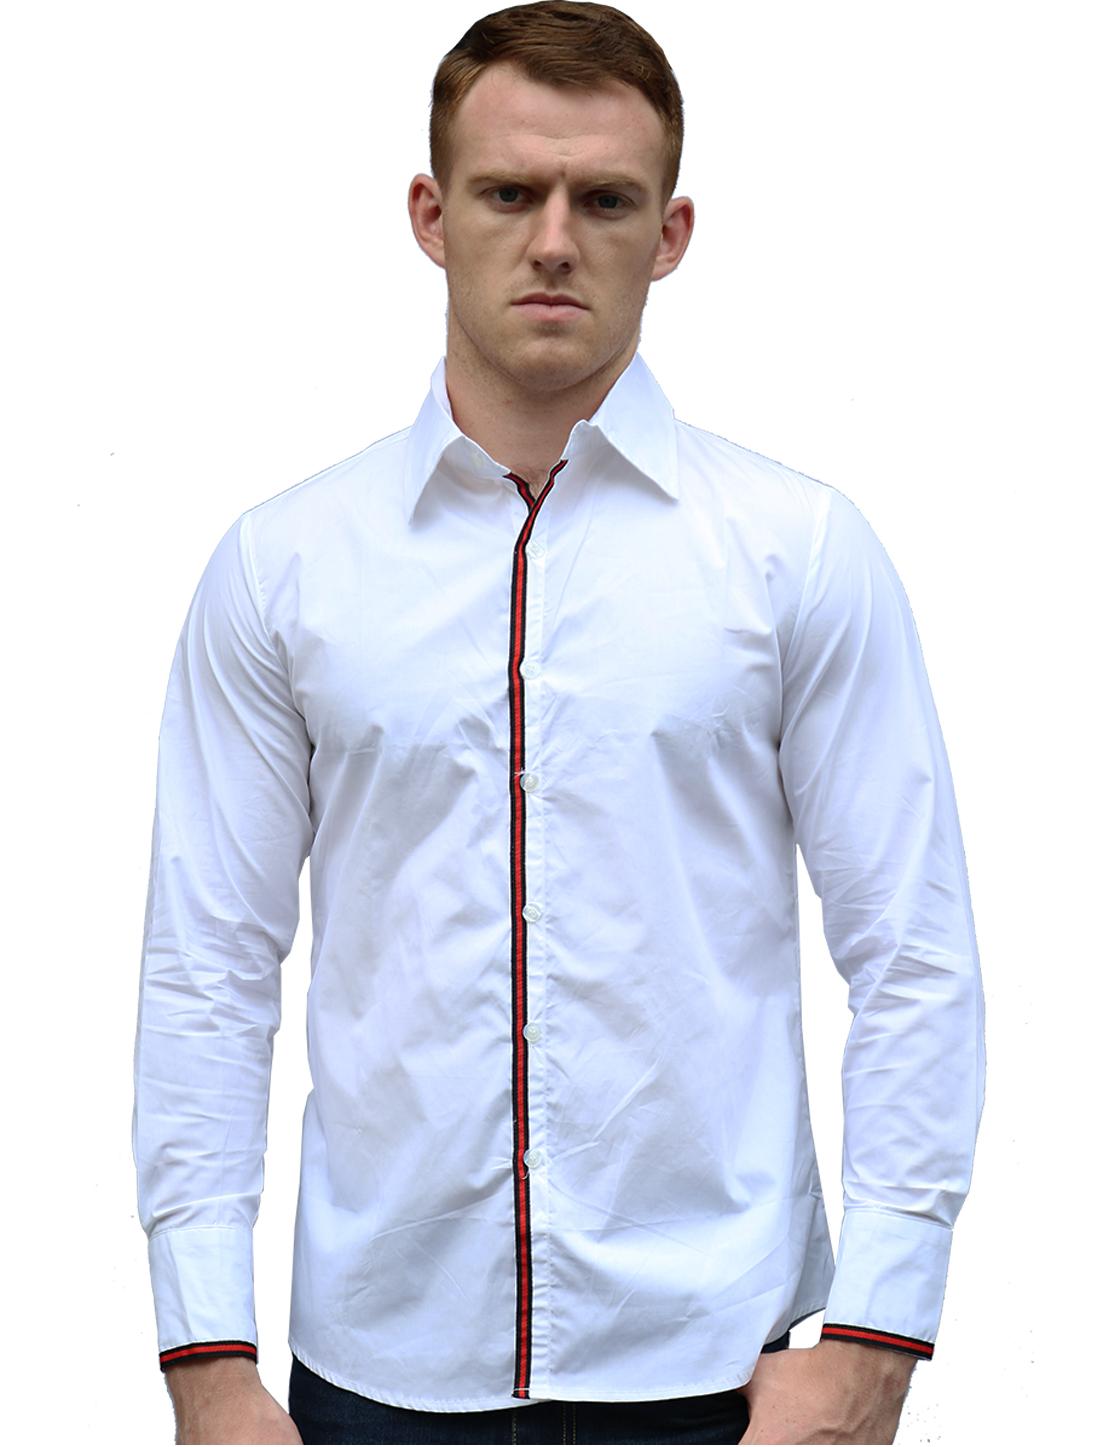 Men Button-Front Stripes Lined Detail Slim Fit Shirt White M